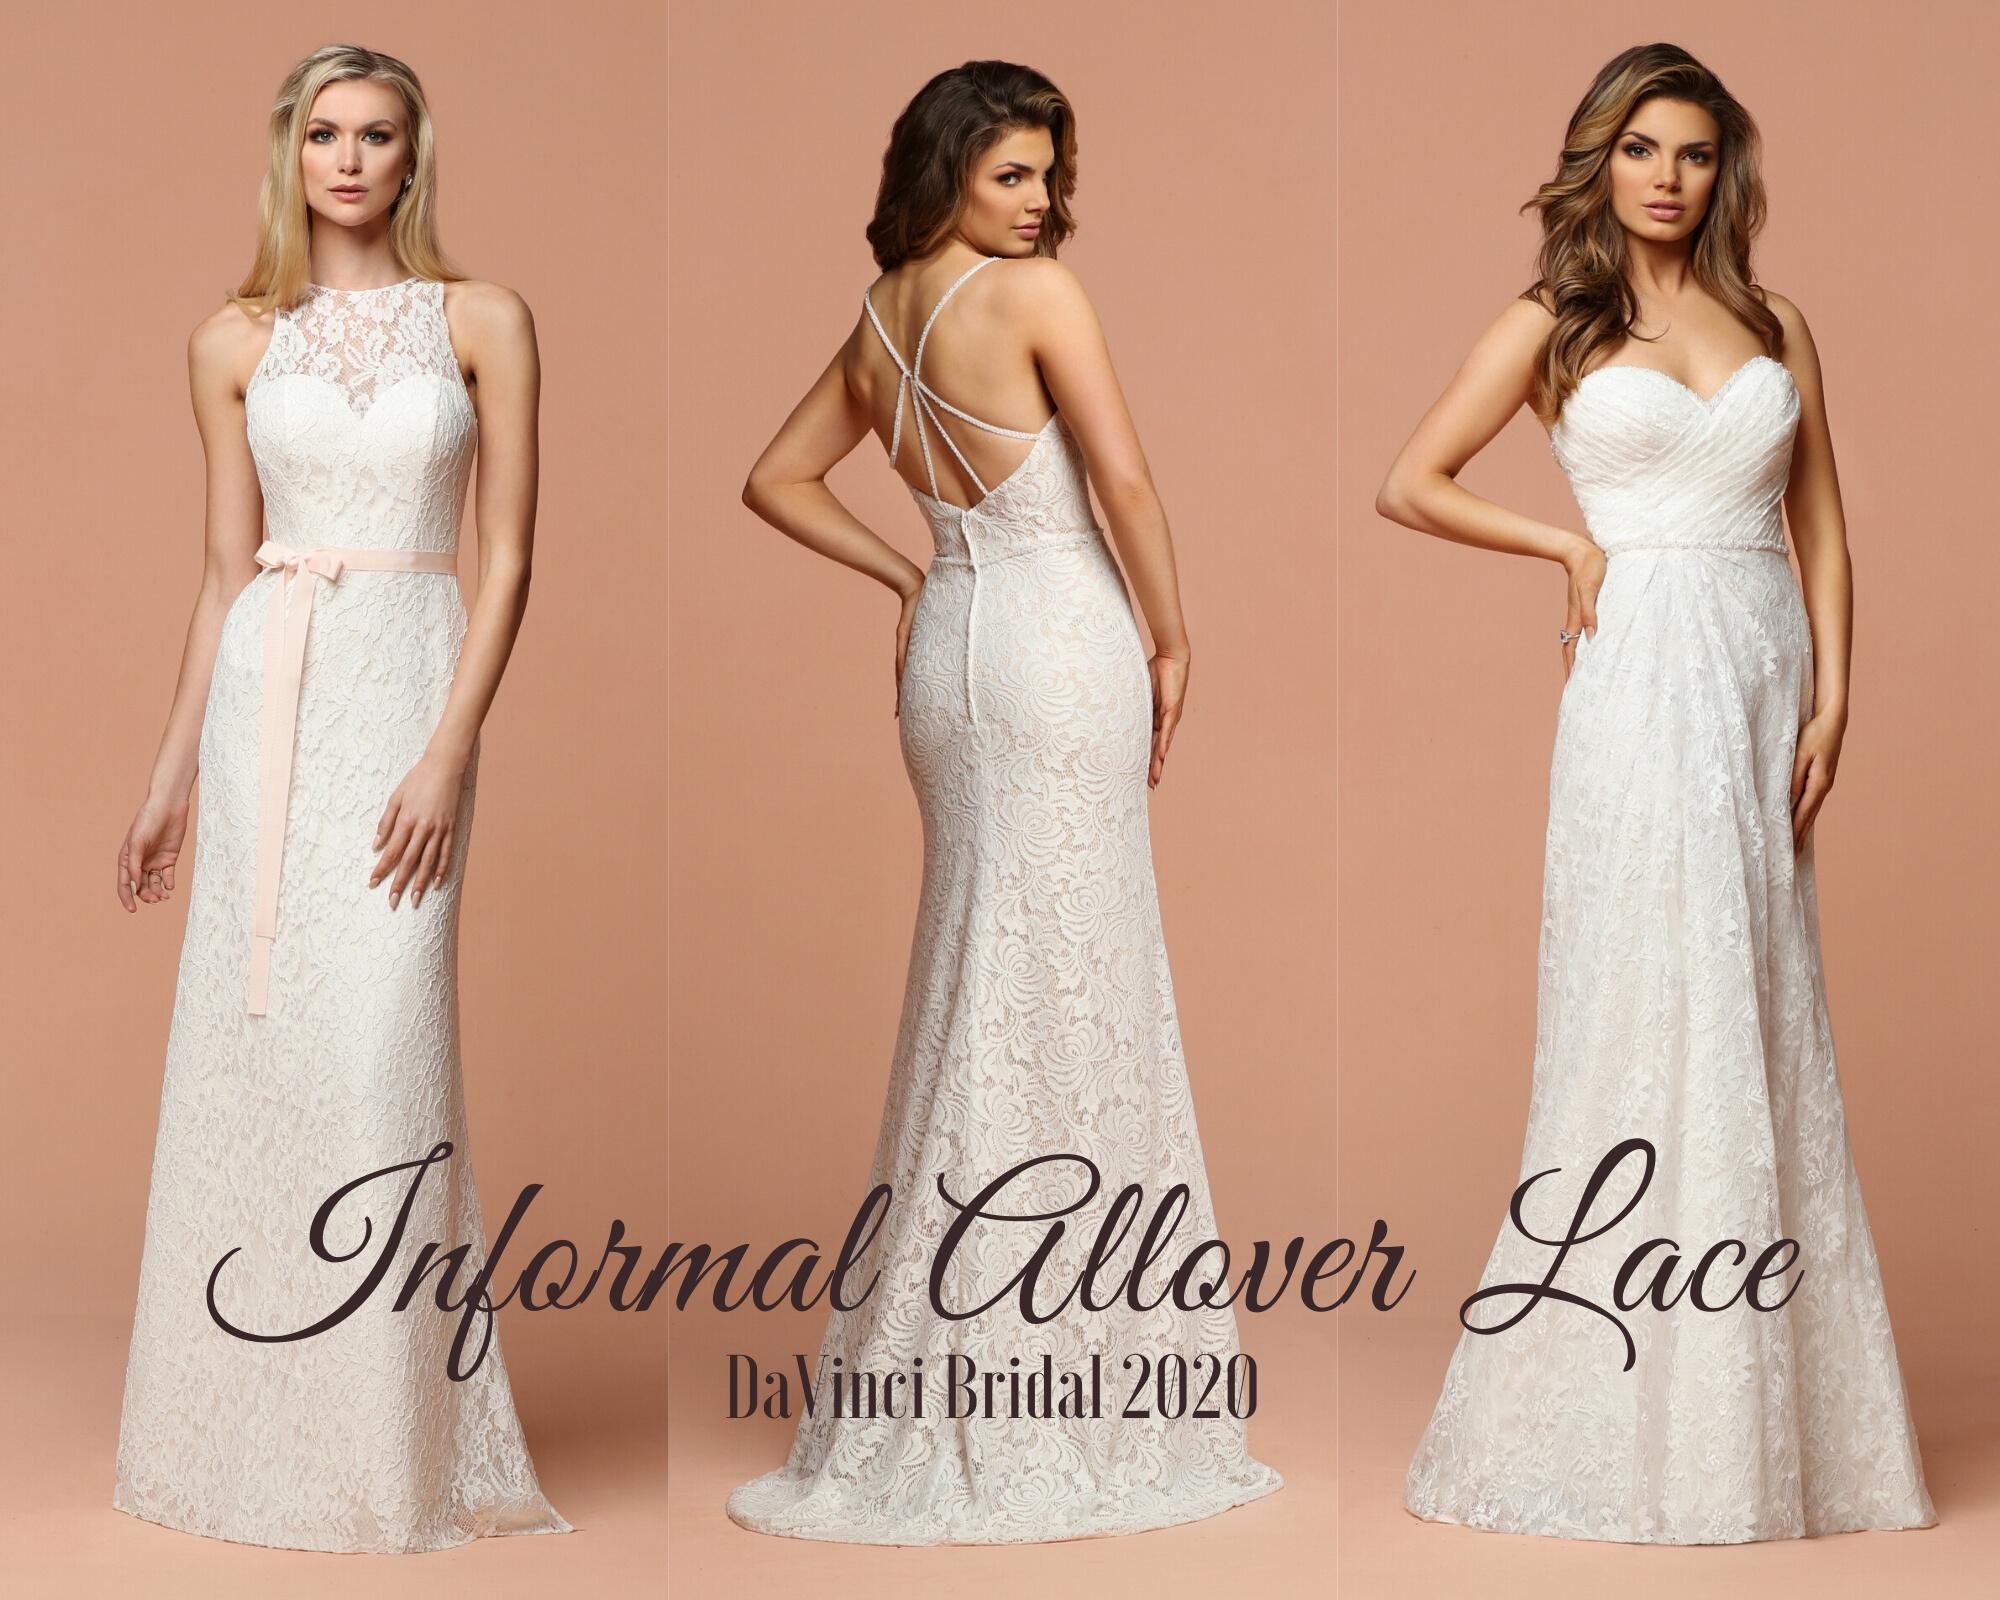 Destination Beach Wedding Dresses 2020 Allover Lace Davinci Bridal,Beach Cocktail Dress Wedding